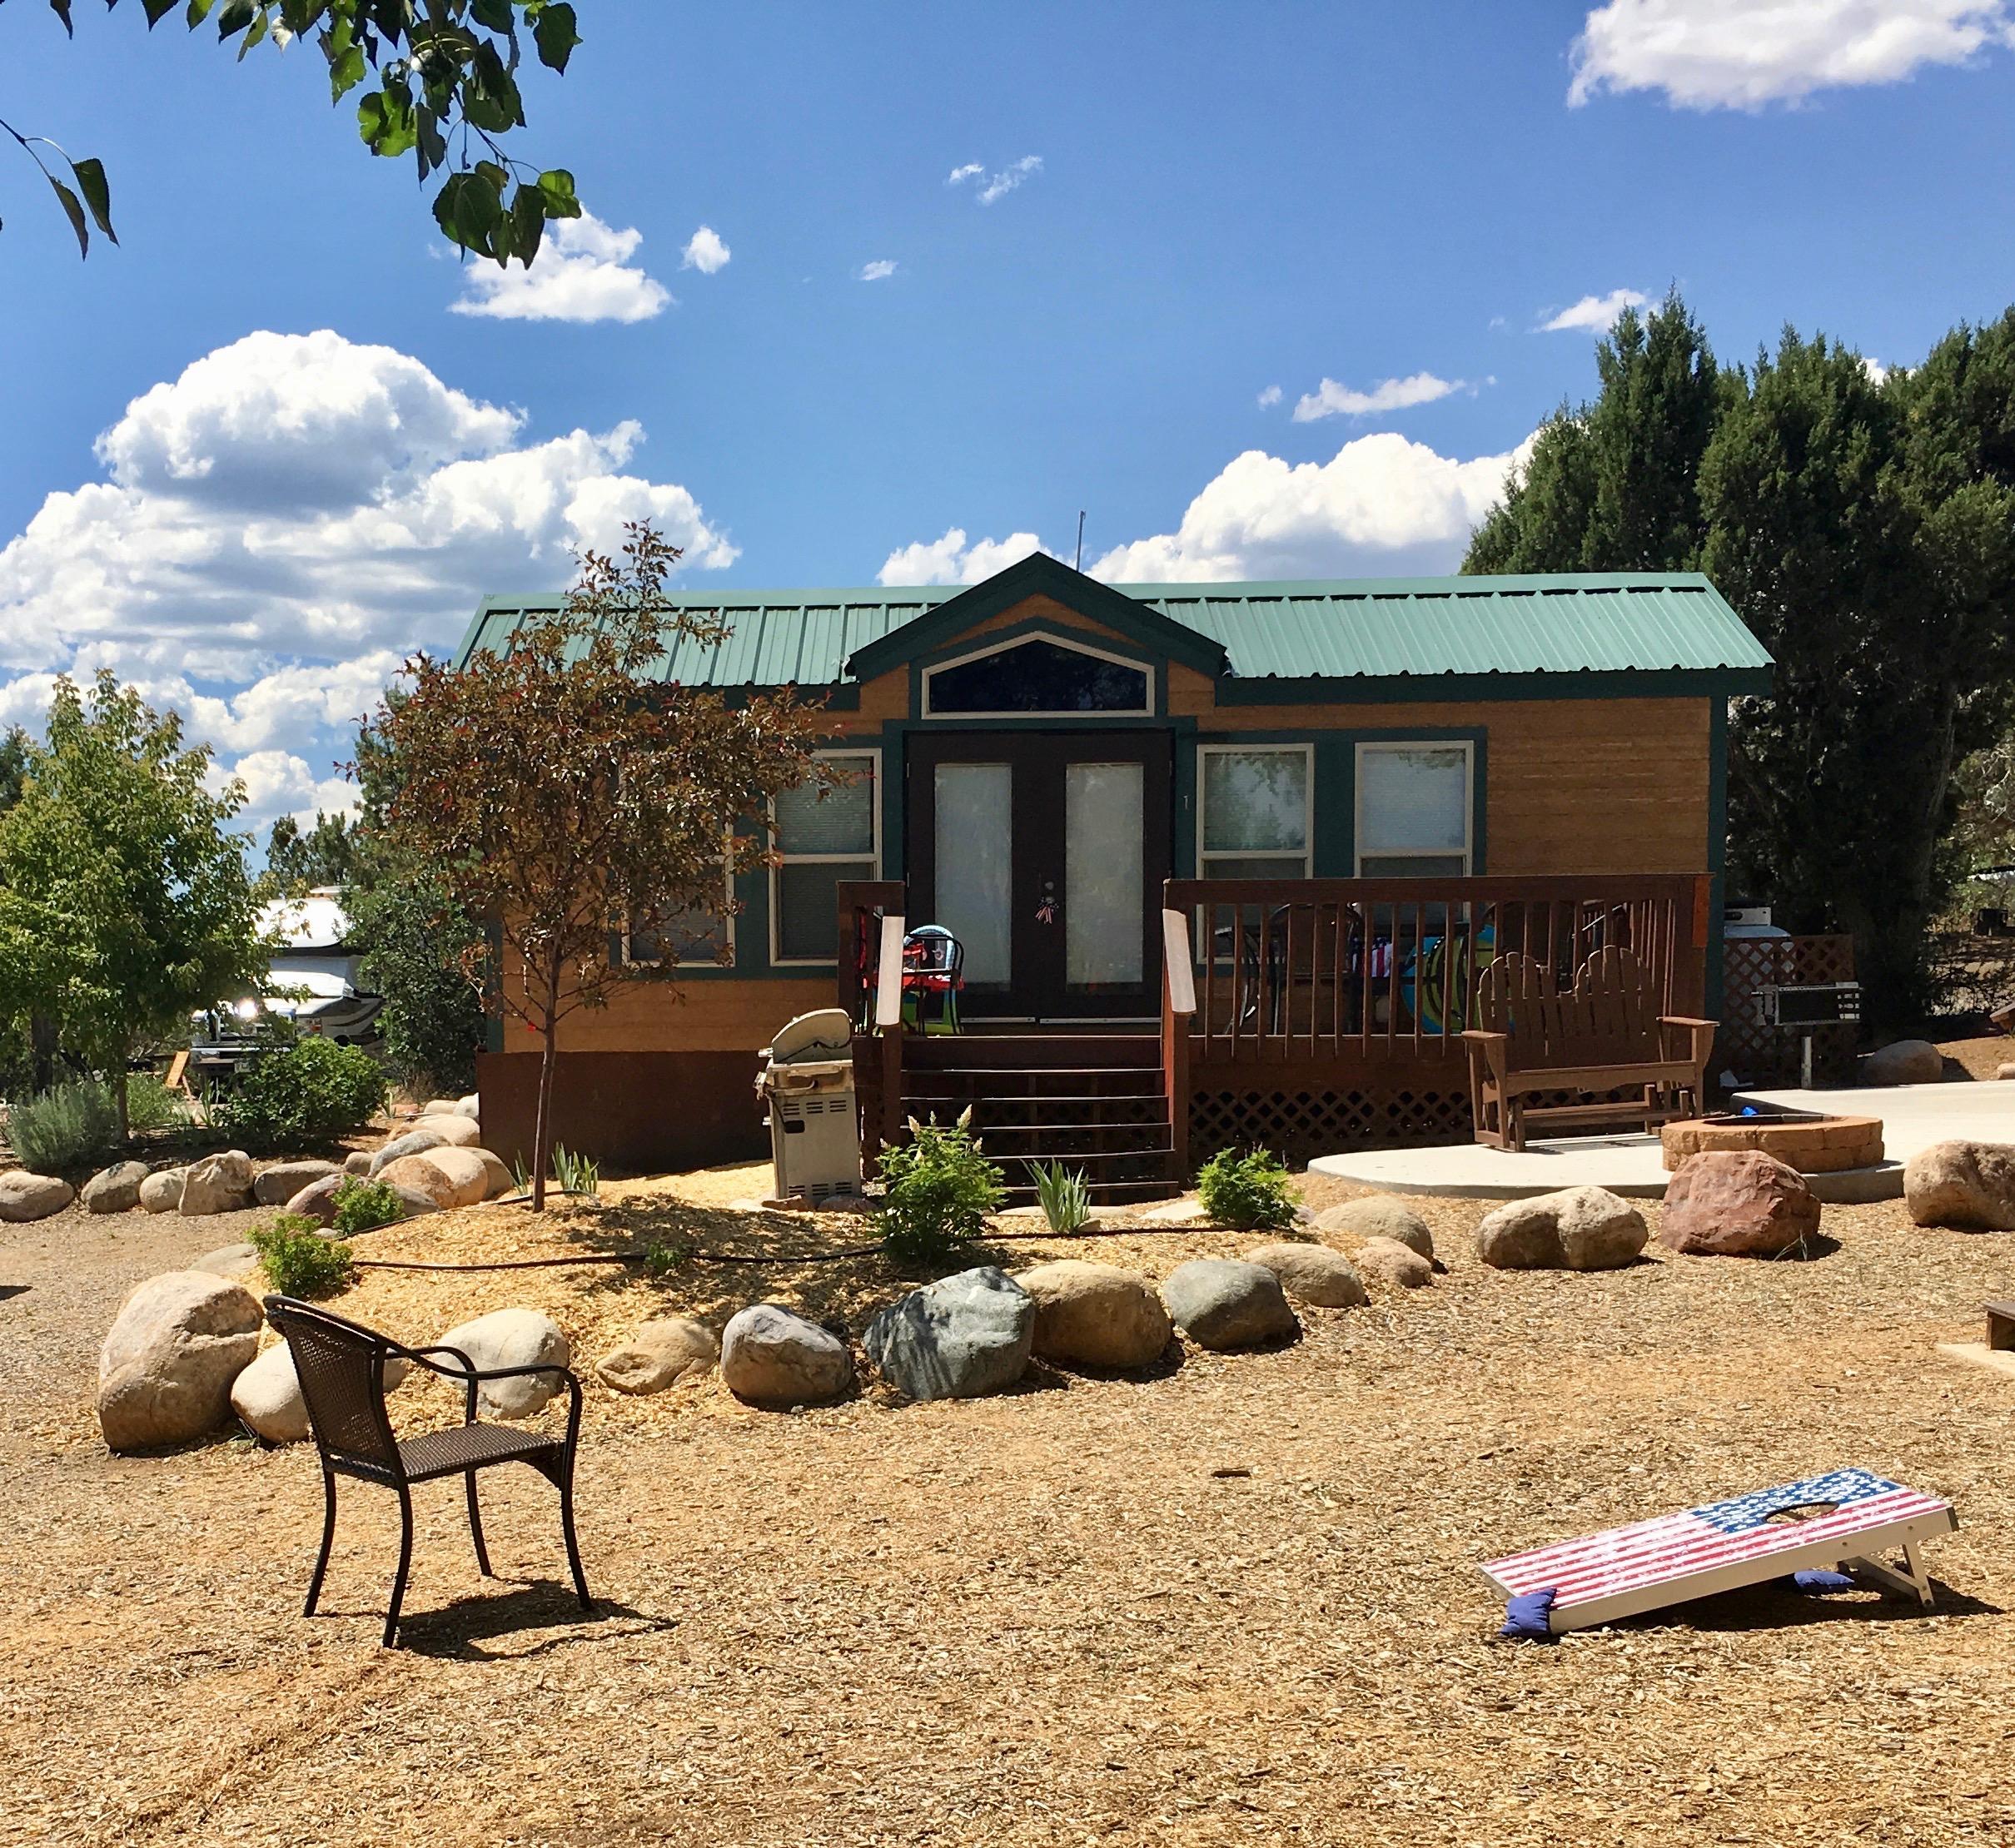 Durango Koa Holiday Coupons Near Me In Durango 8coupons